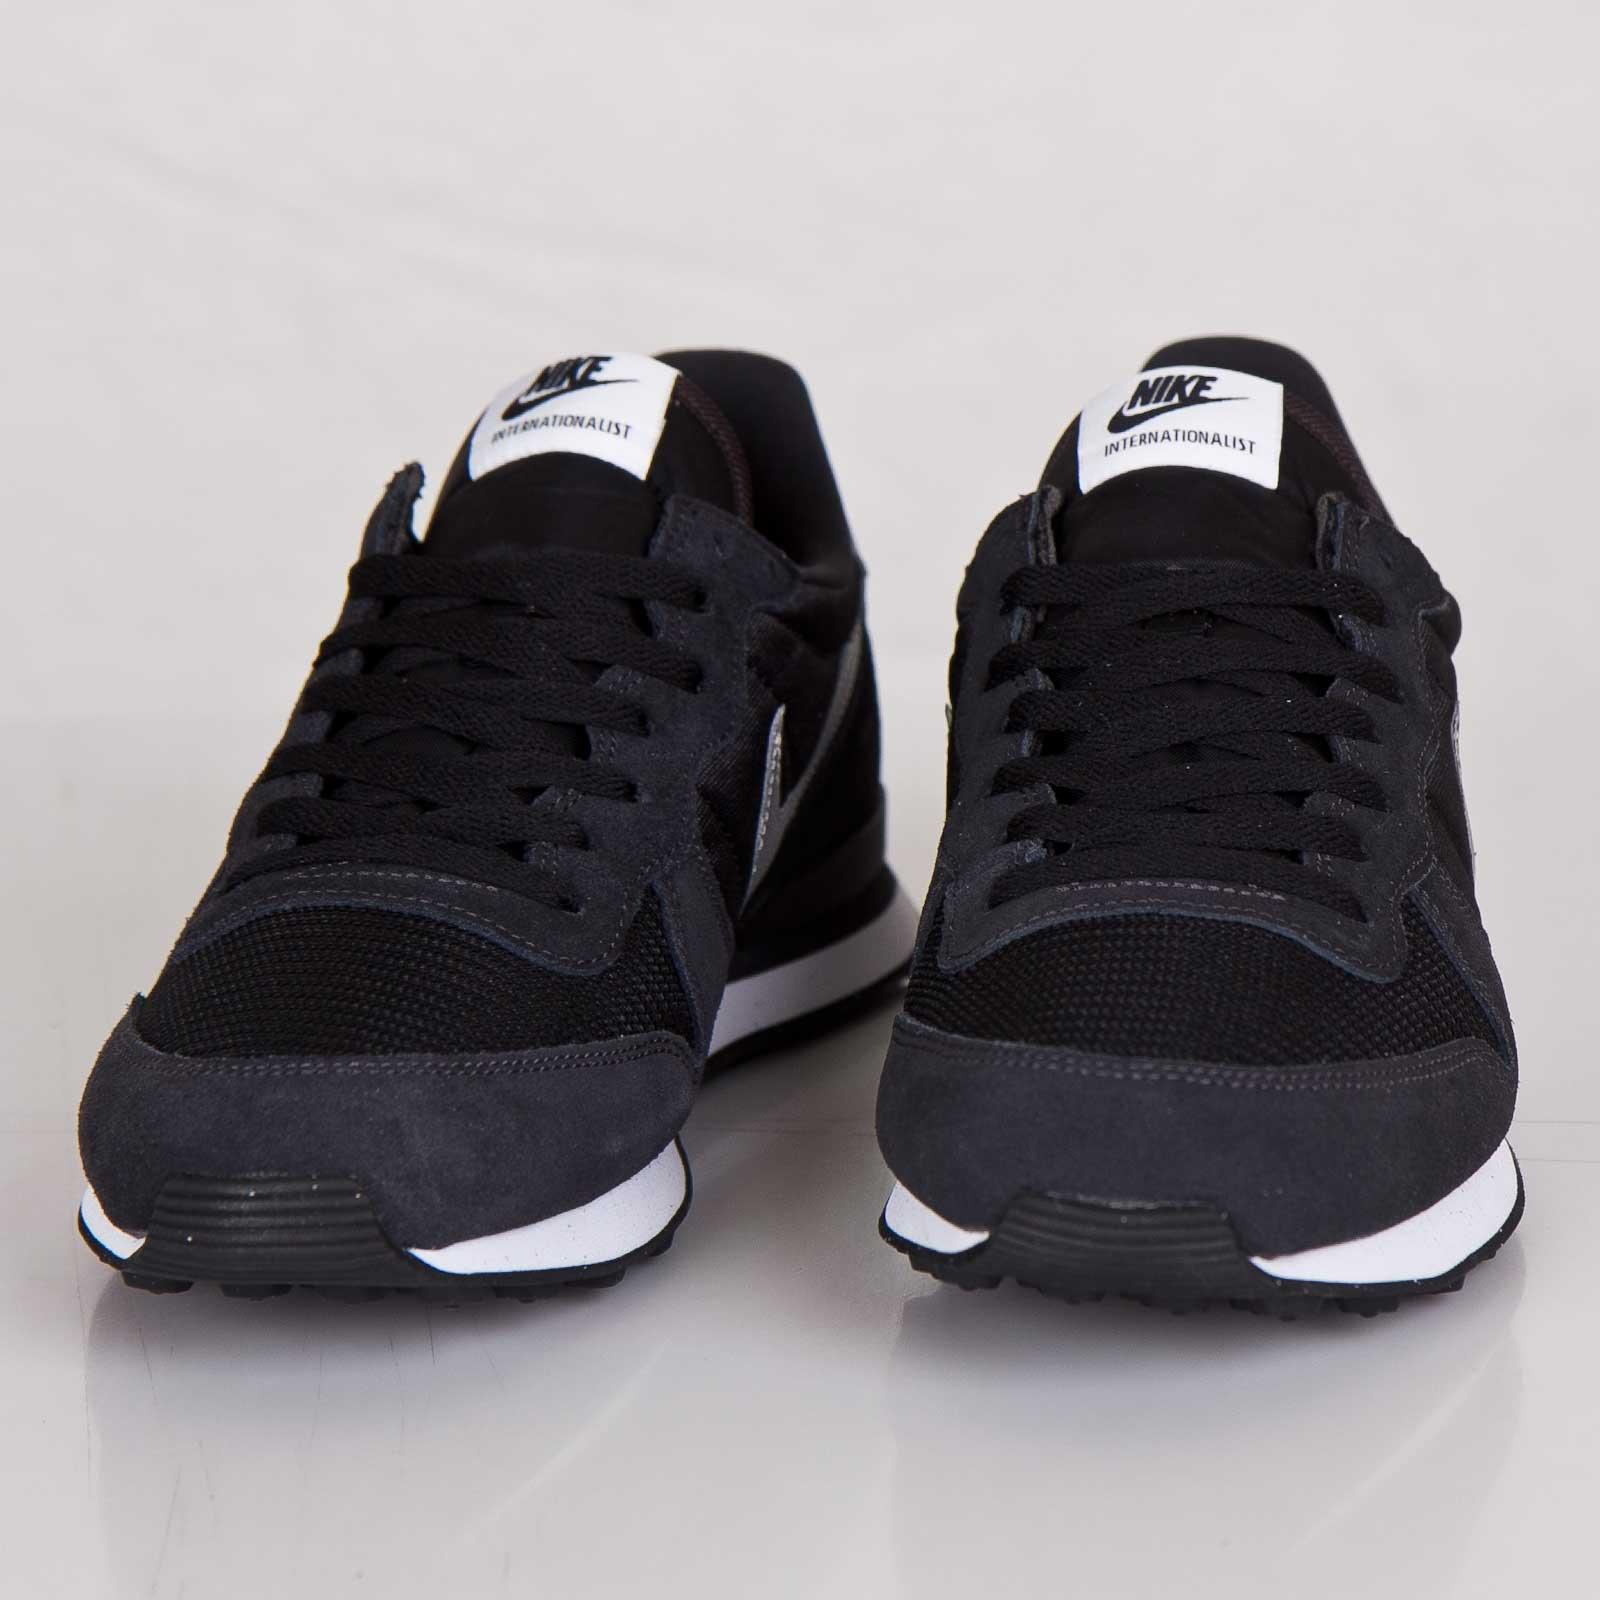 Work Vans For Sale >> Nike Internationalist - 631754-003 - Sneakersnstuff | sneakers & streetwear online since 1999